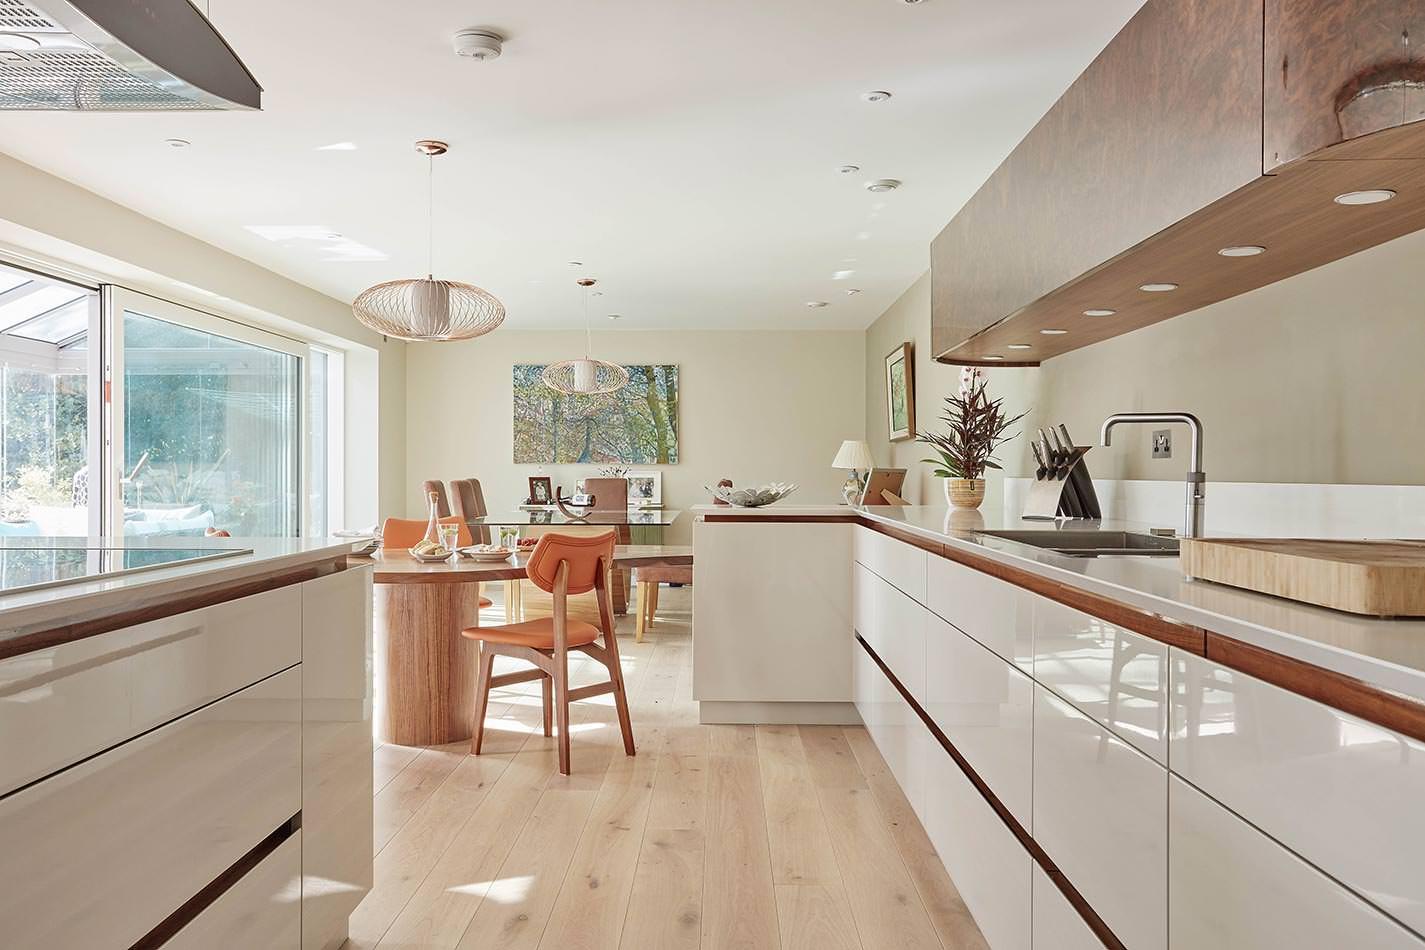 20 midcentury style kitchen ideas for 2018 for Bespoke kitchen ideas